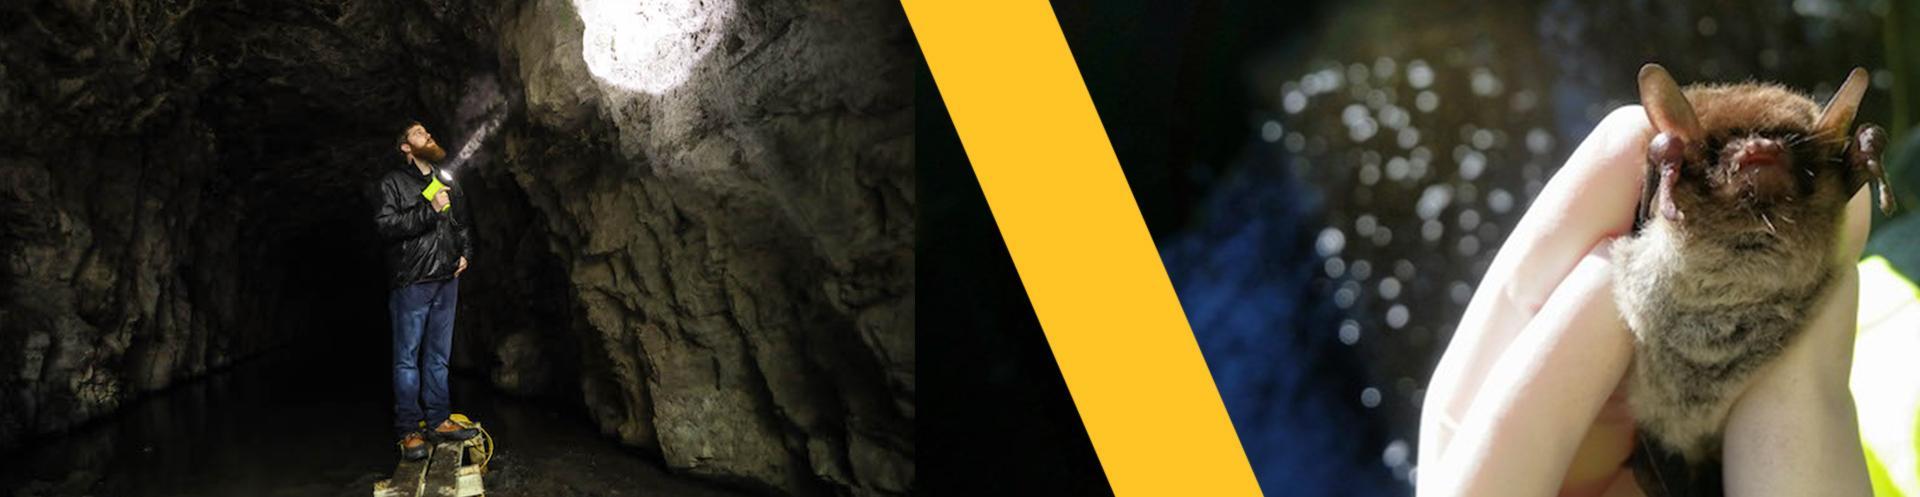 Saving Bats from Extinction